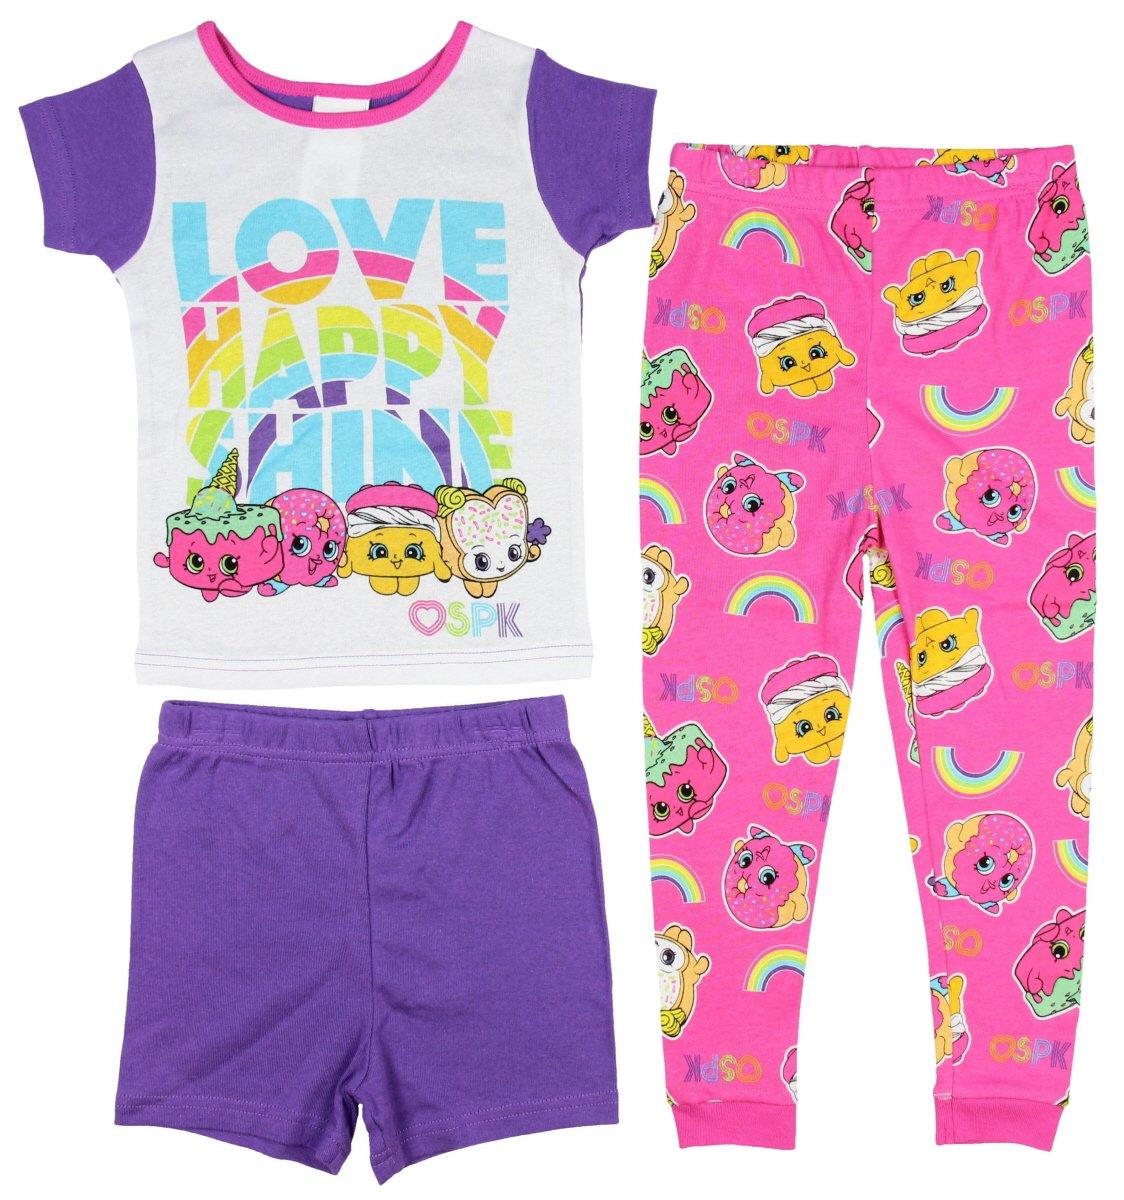 Shopkins 3-Piece Girls Cotton Pajama Set, Love Happy Shine (10)